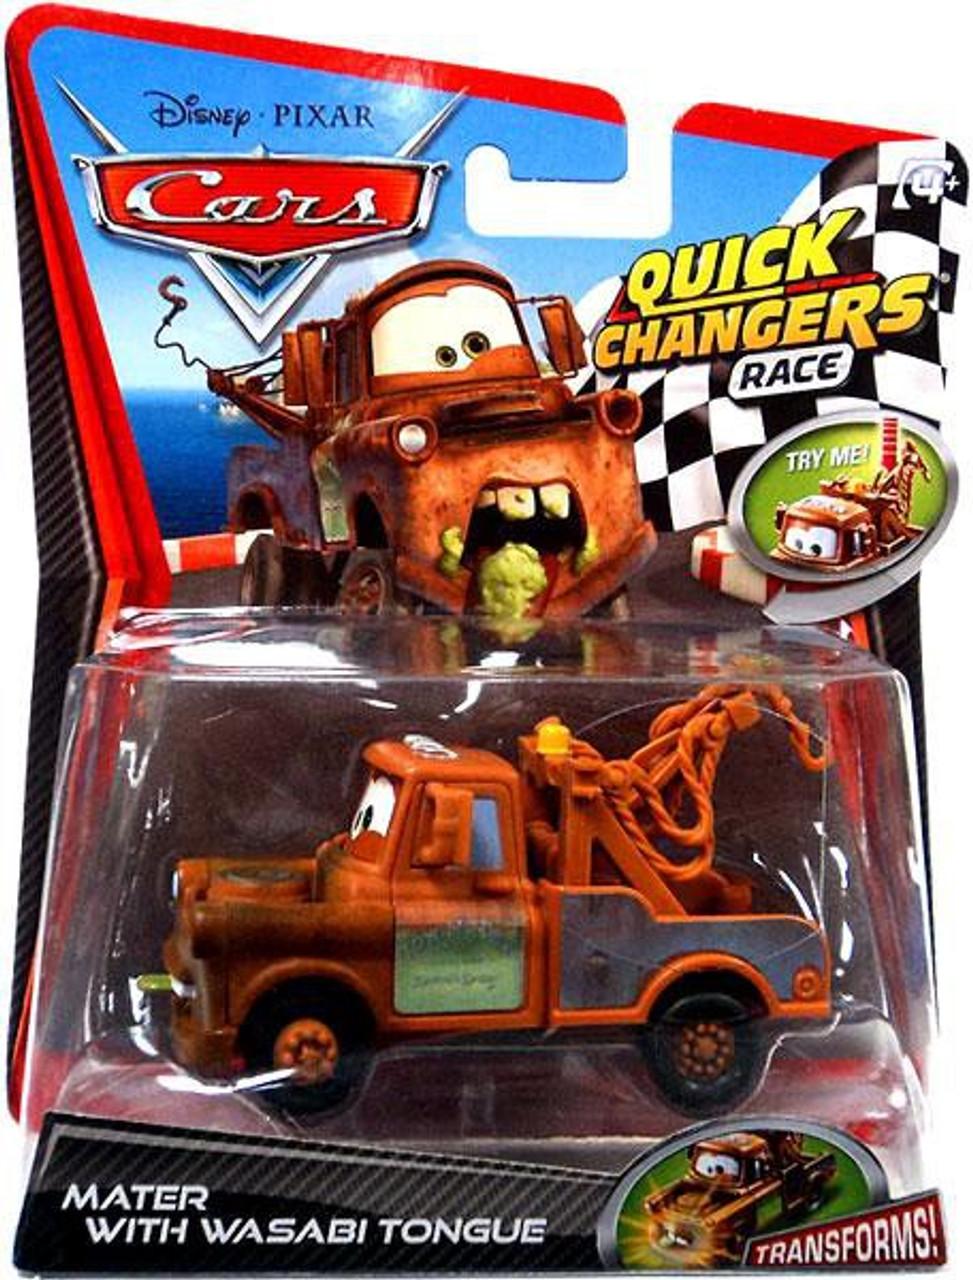 Disney Pixar Cars Cars 2 Quick Changers Race Mater With Wasabi